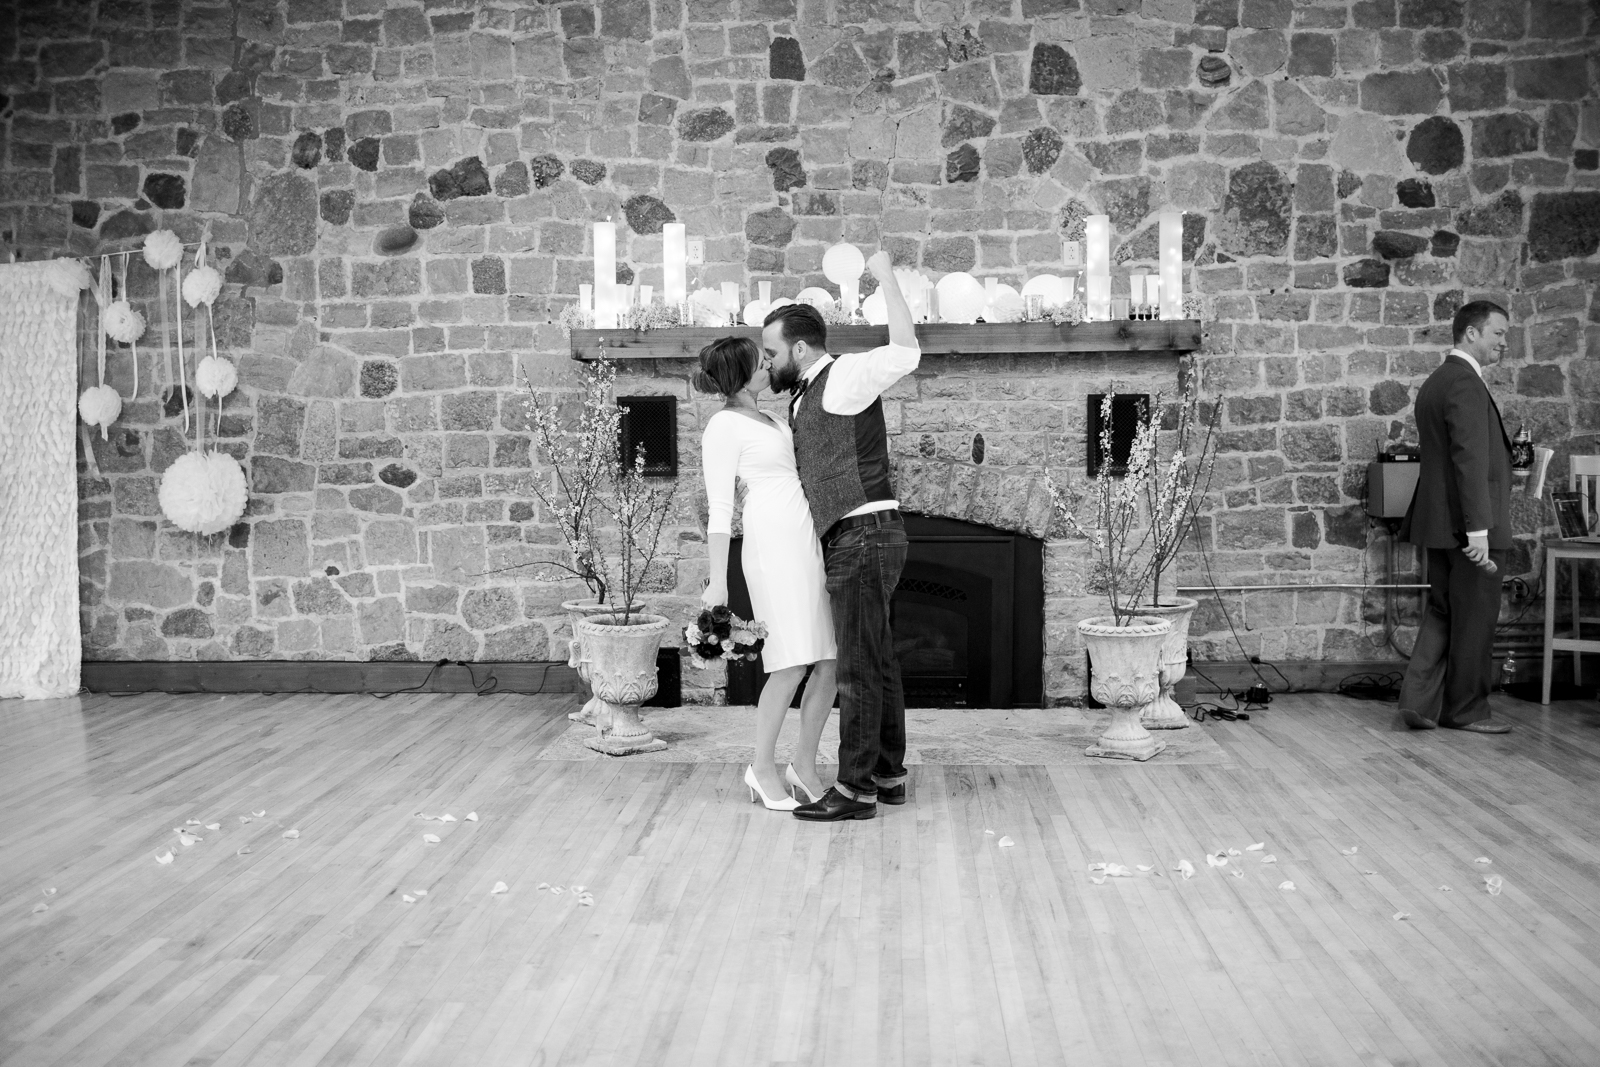 sepandstellwiconsinwedding-26.jpg